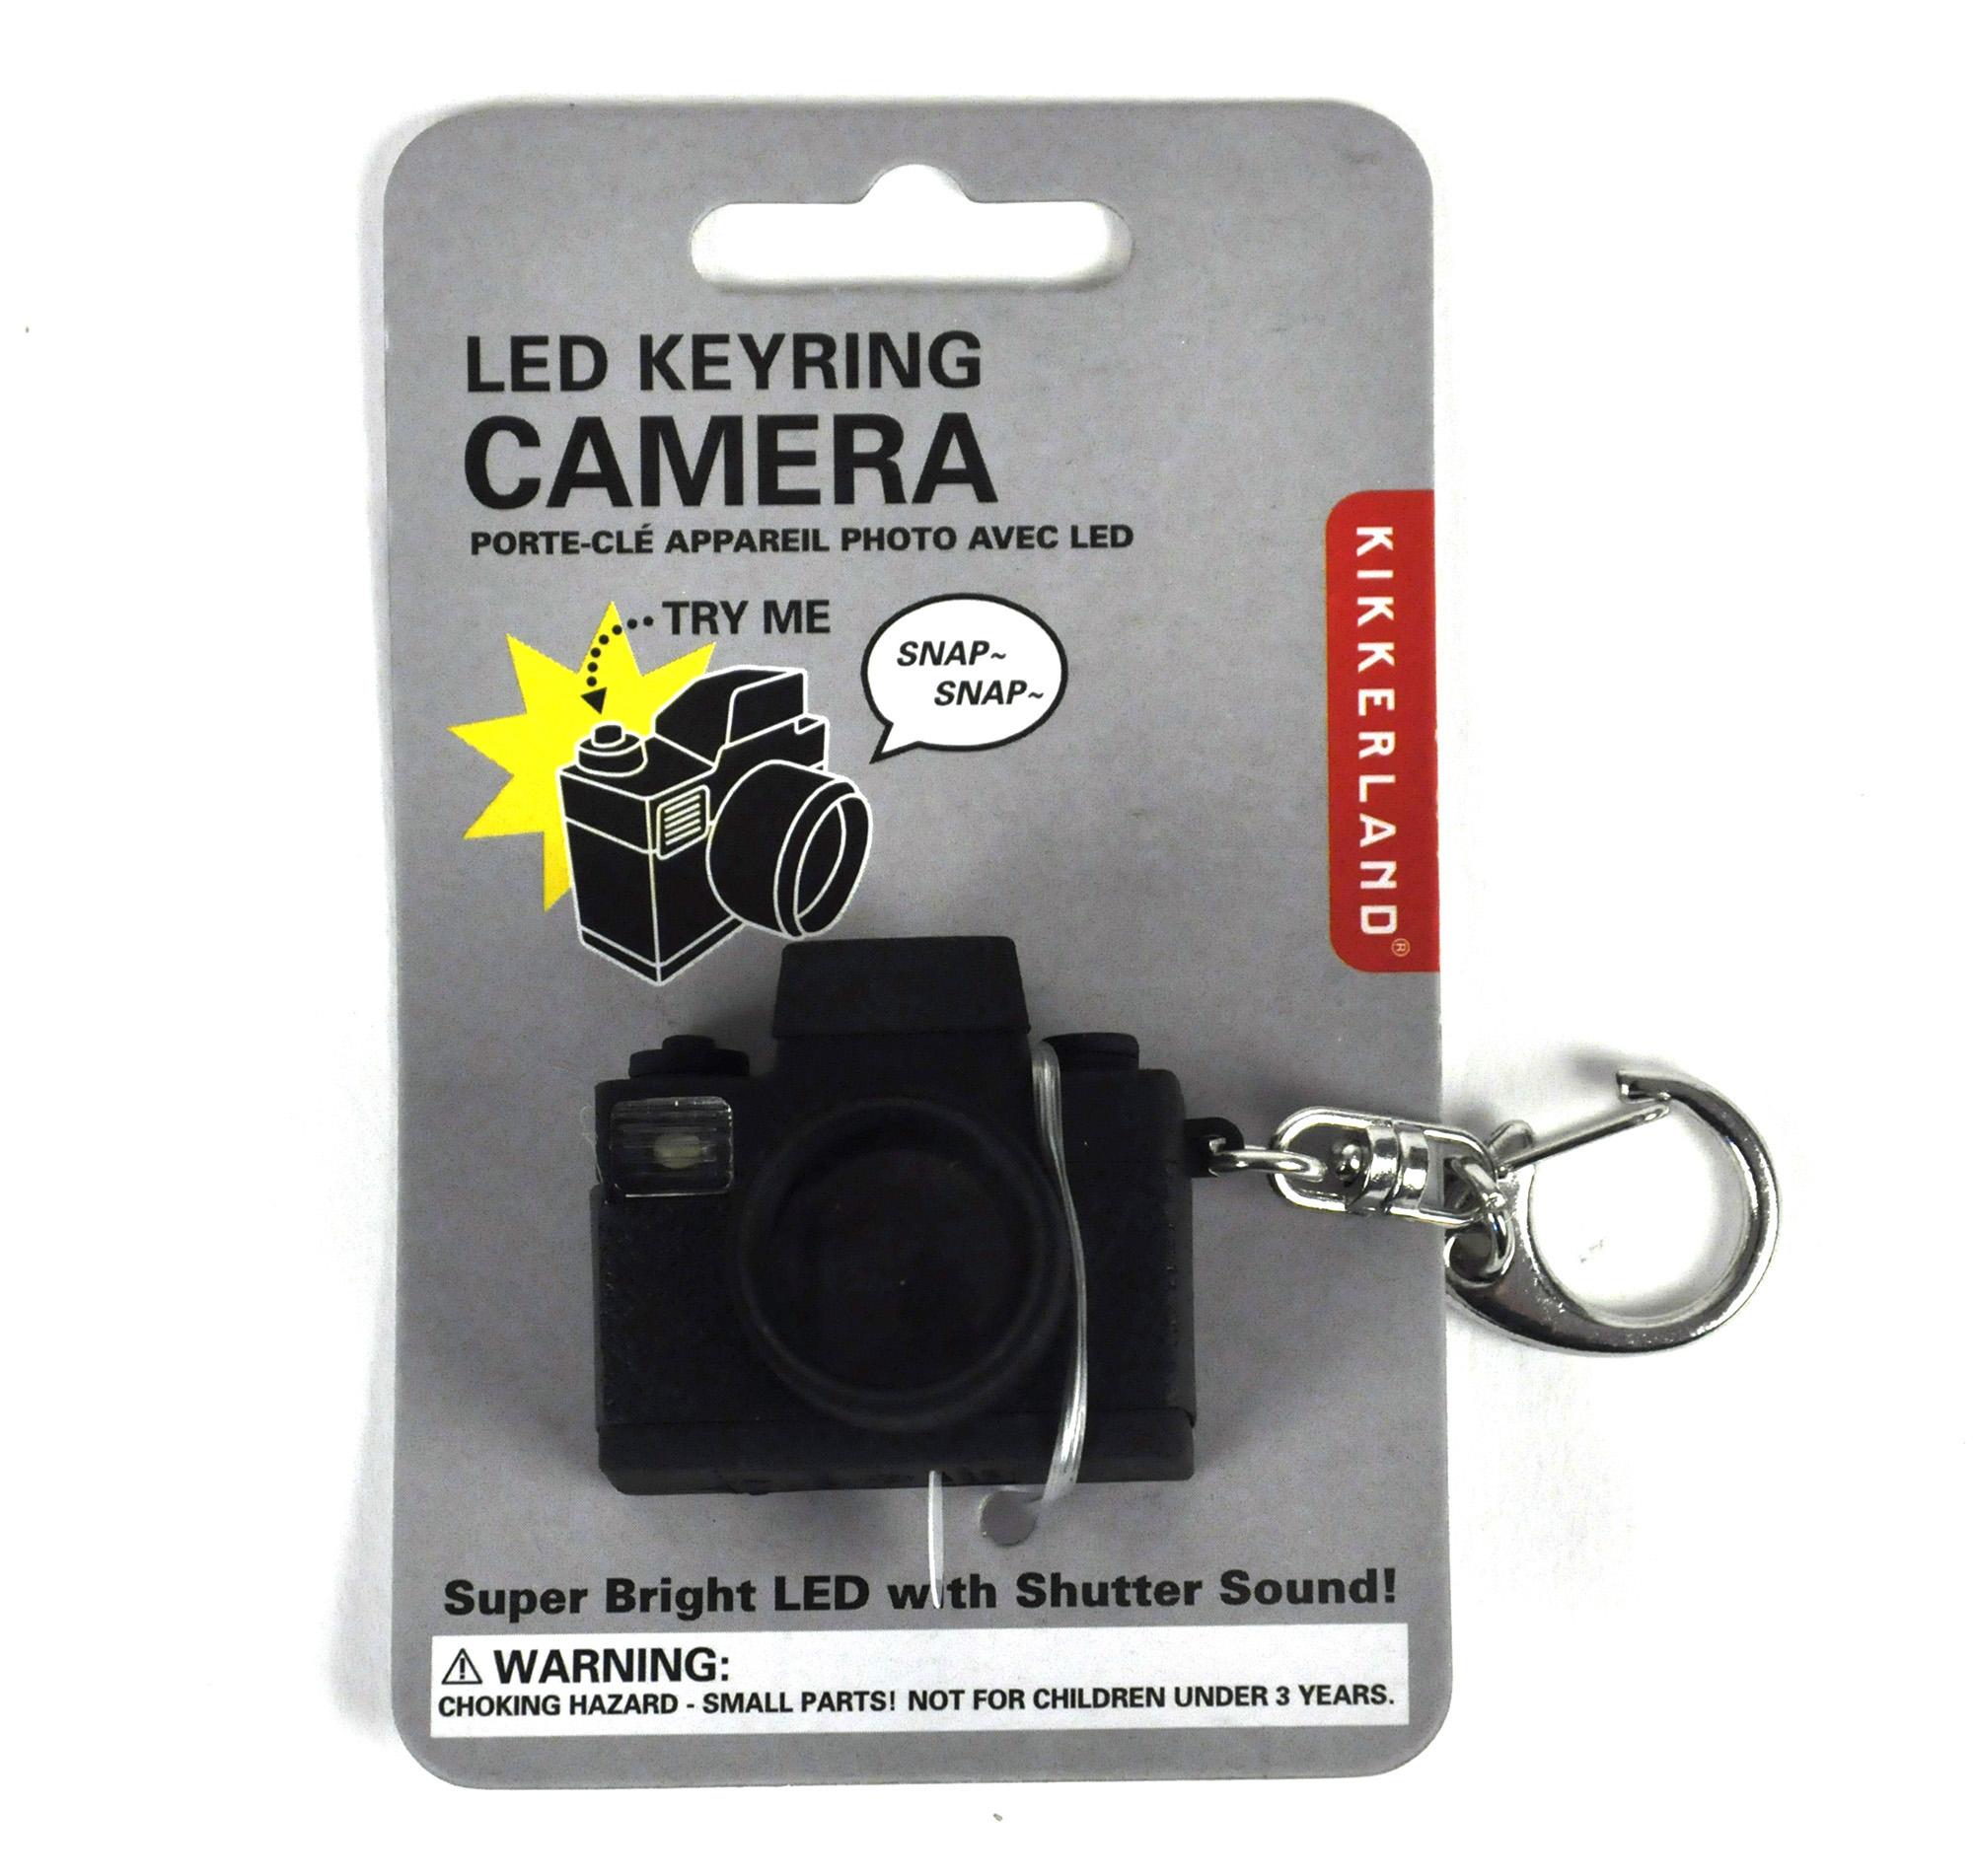 Led Keyring Camera Flash With Sound Effect   Pink Cat Shop